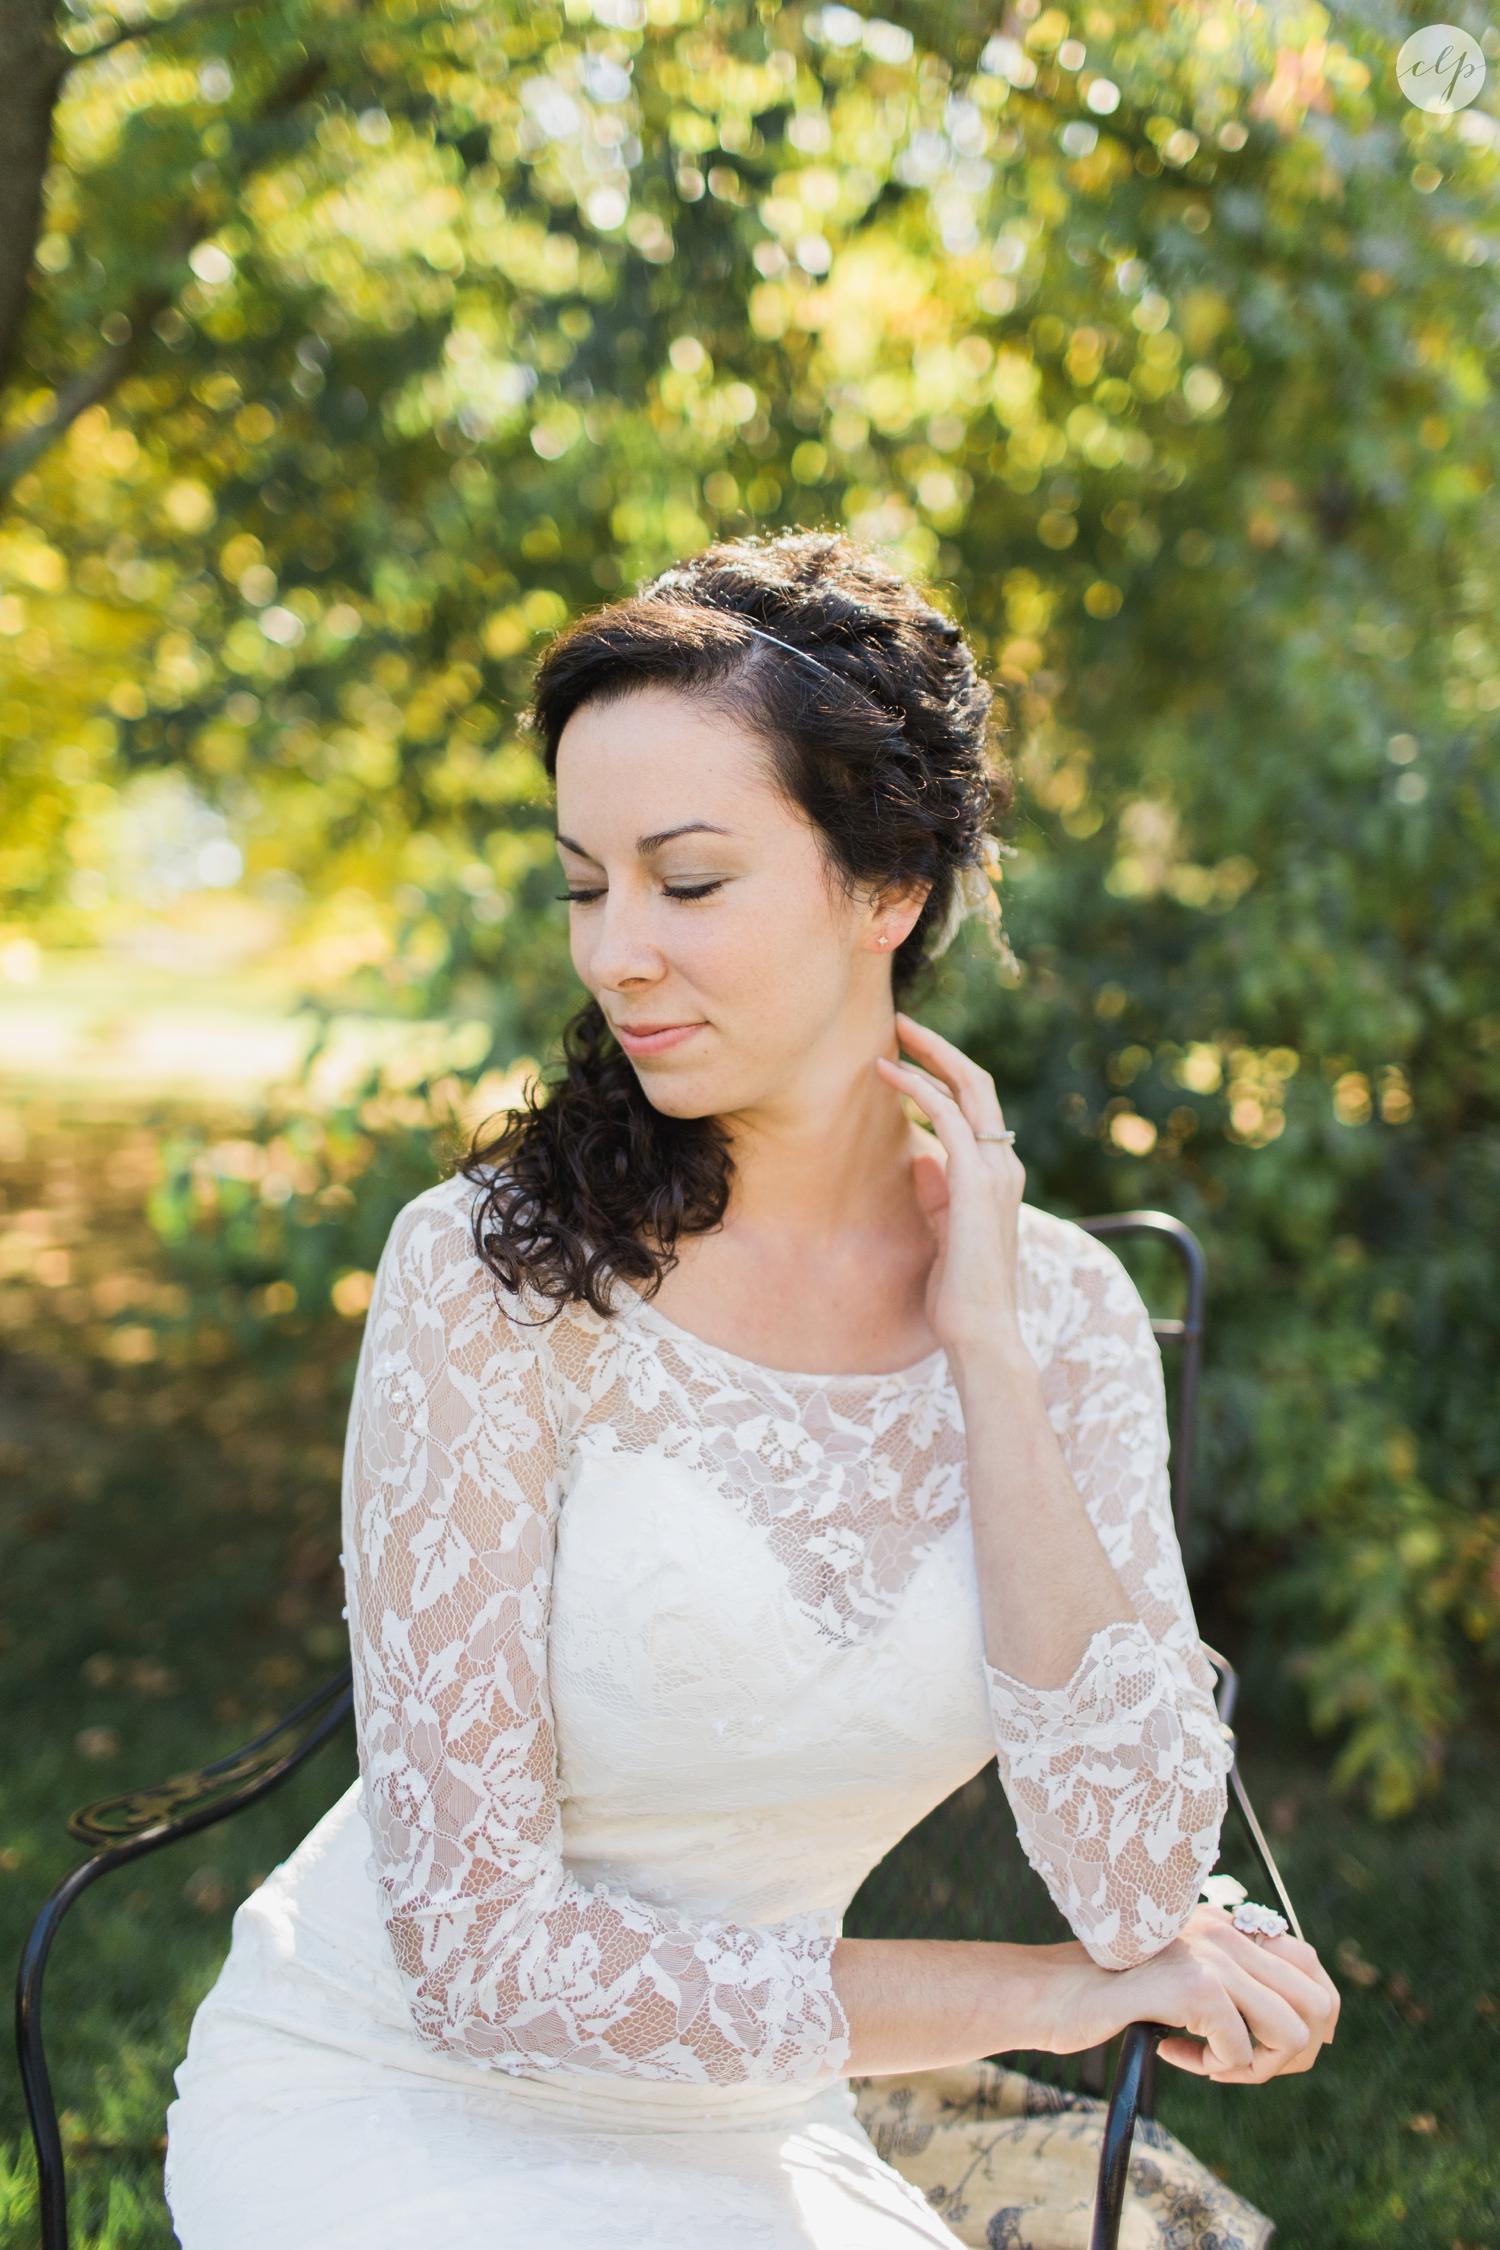 Outdoor-Wedding-in-the-Woods-Photography_4177.jpg